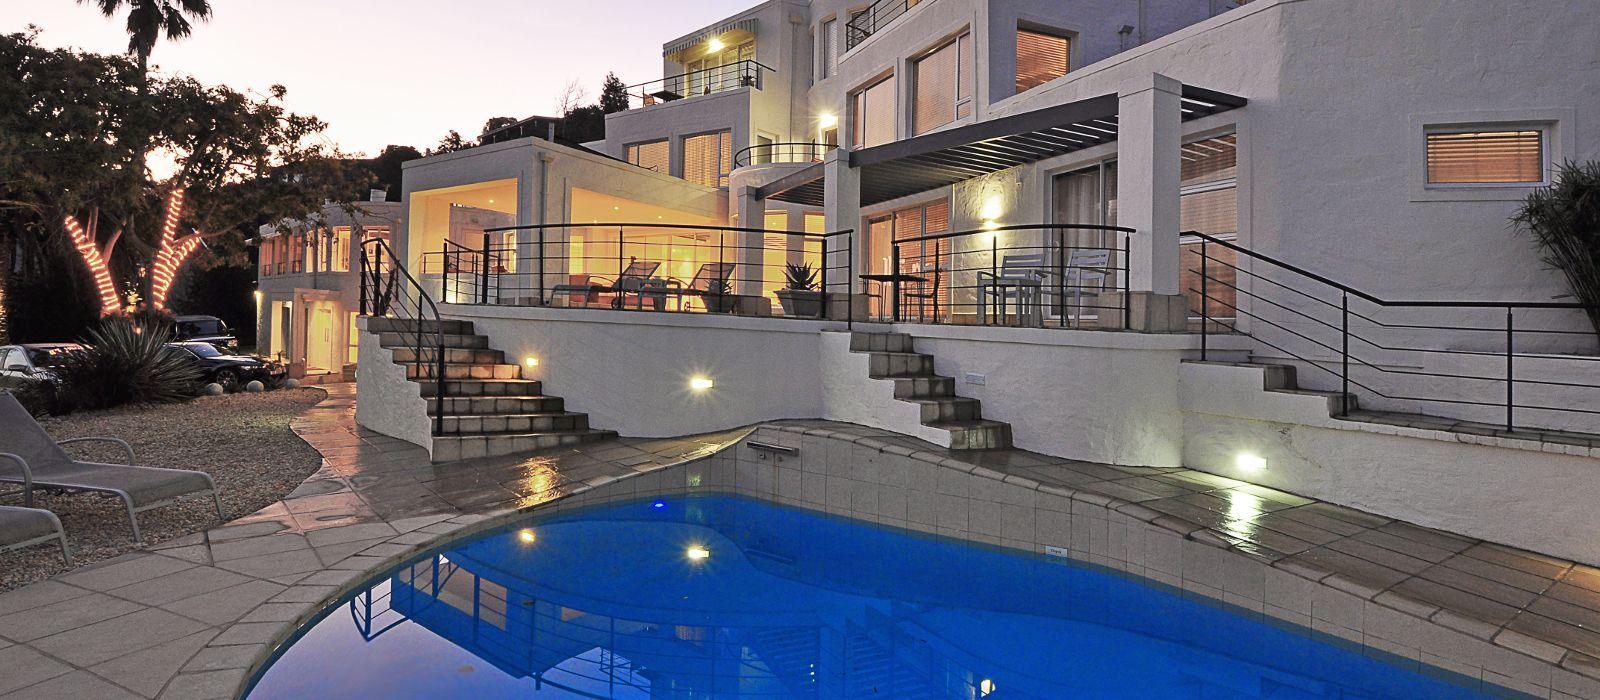 Hotel Villa Afrikana South Africa